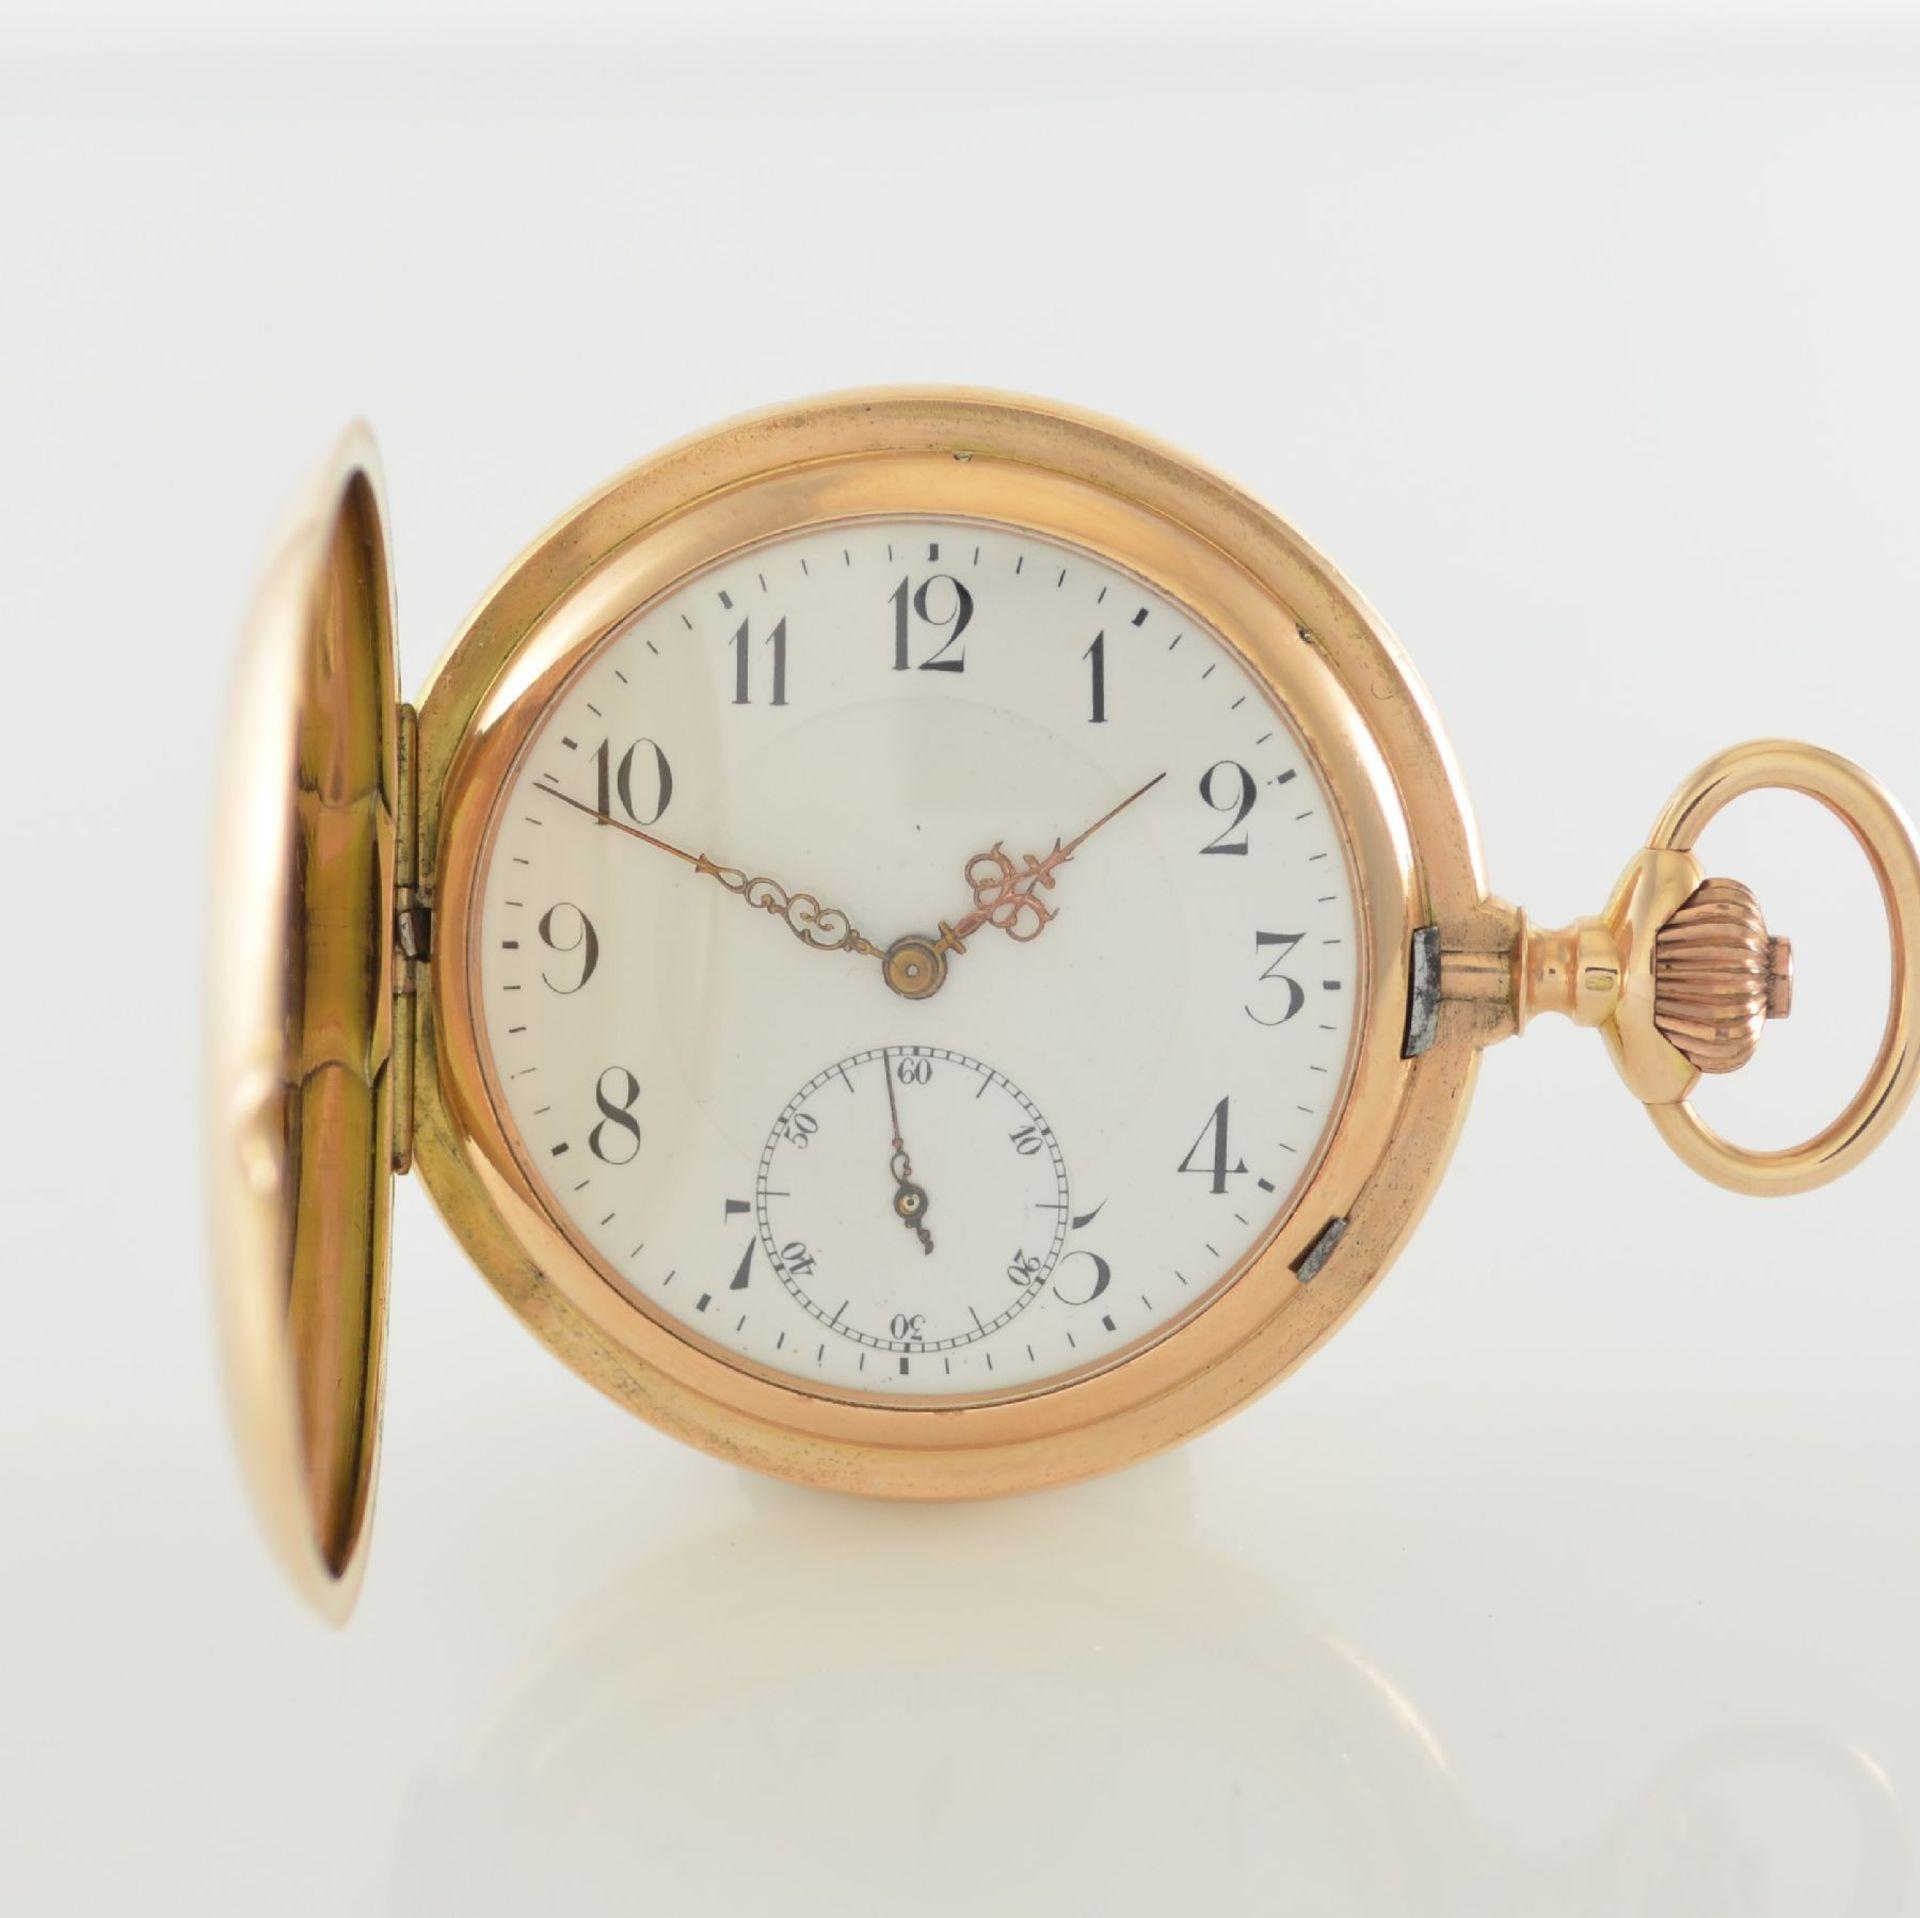 Herrensavonette in RG 585/000, Schweiz um 1900, guill. 3-Deckel Goldgeh. berieben/dell., à-goutte-